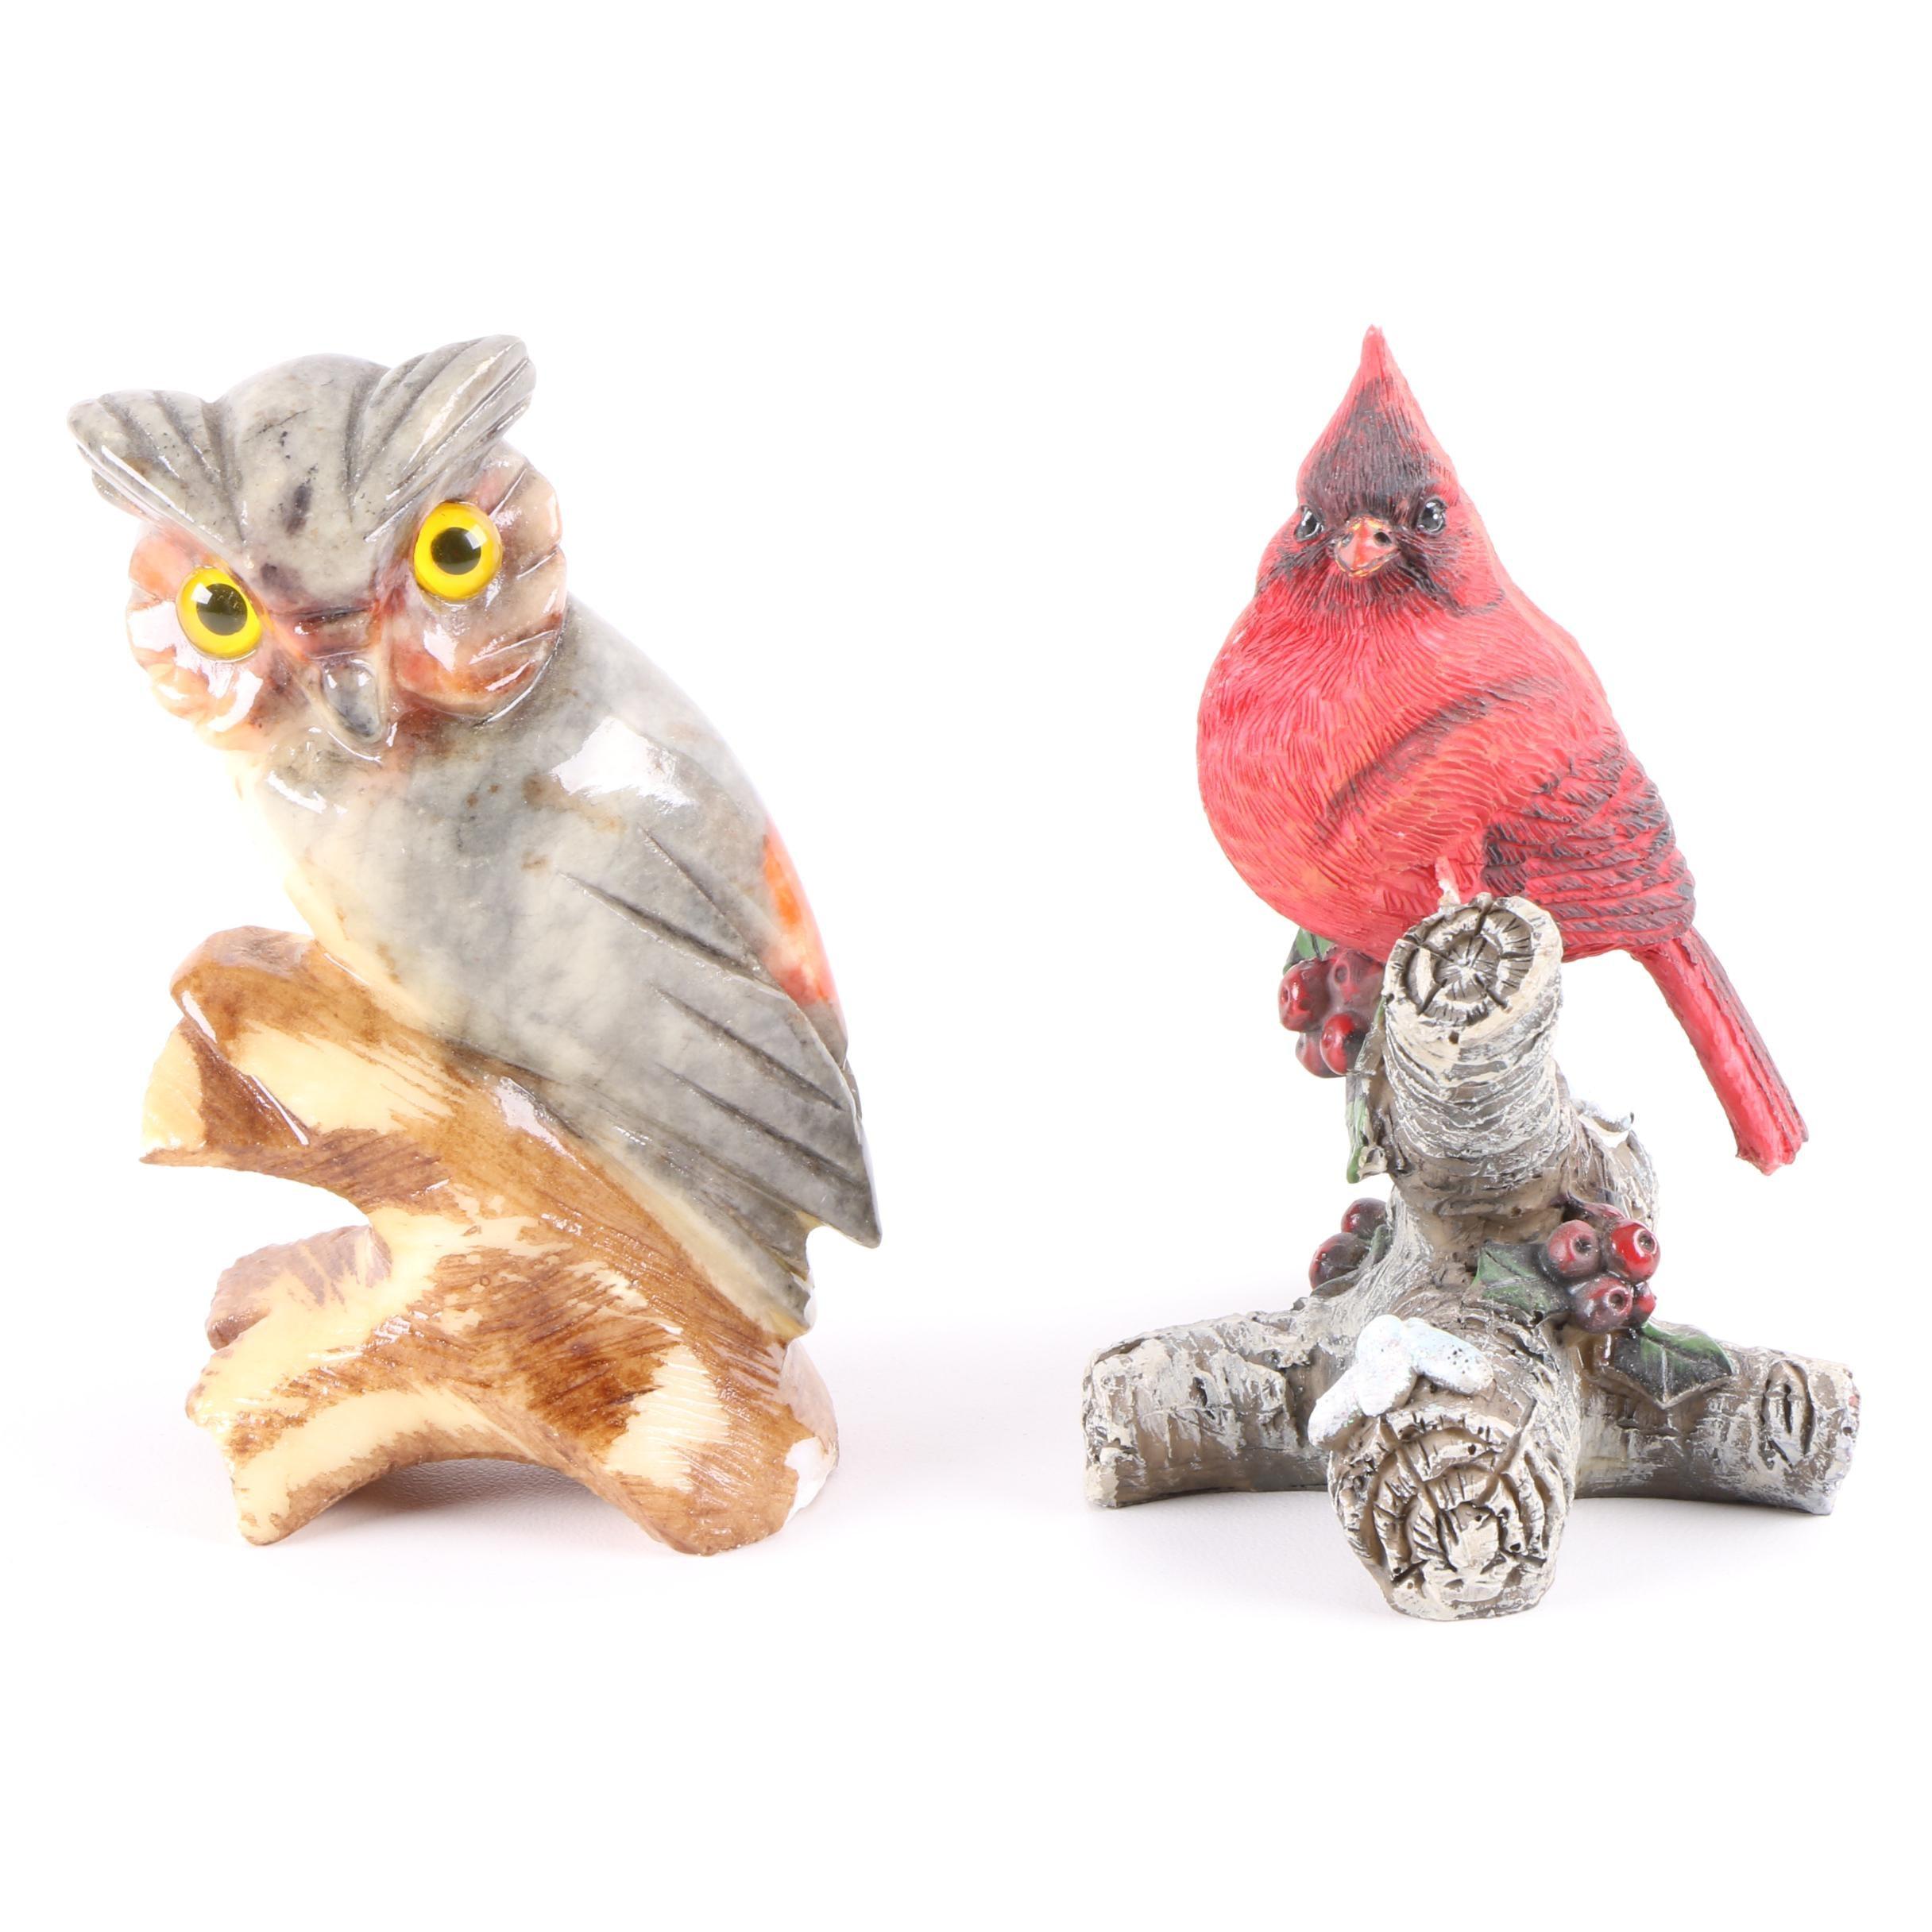 Owl and Cardinal Figurines